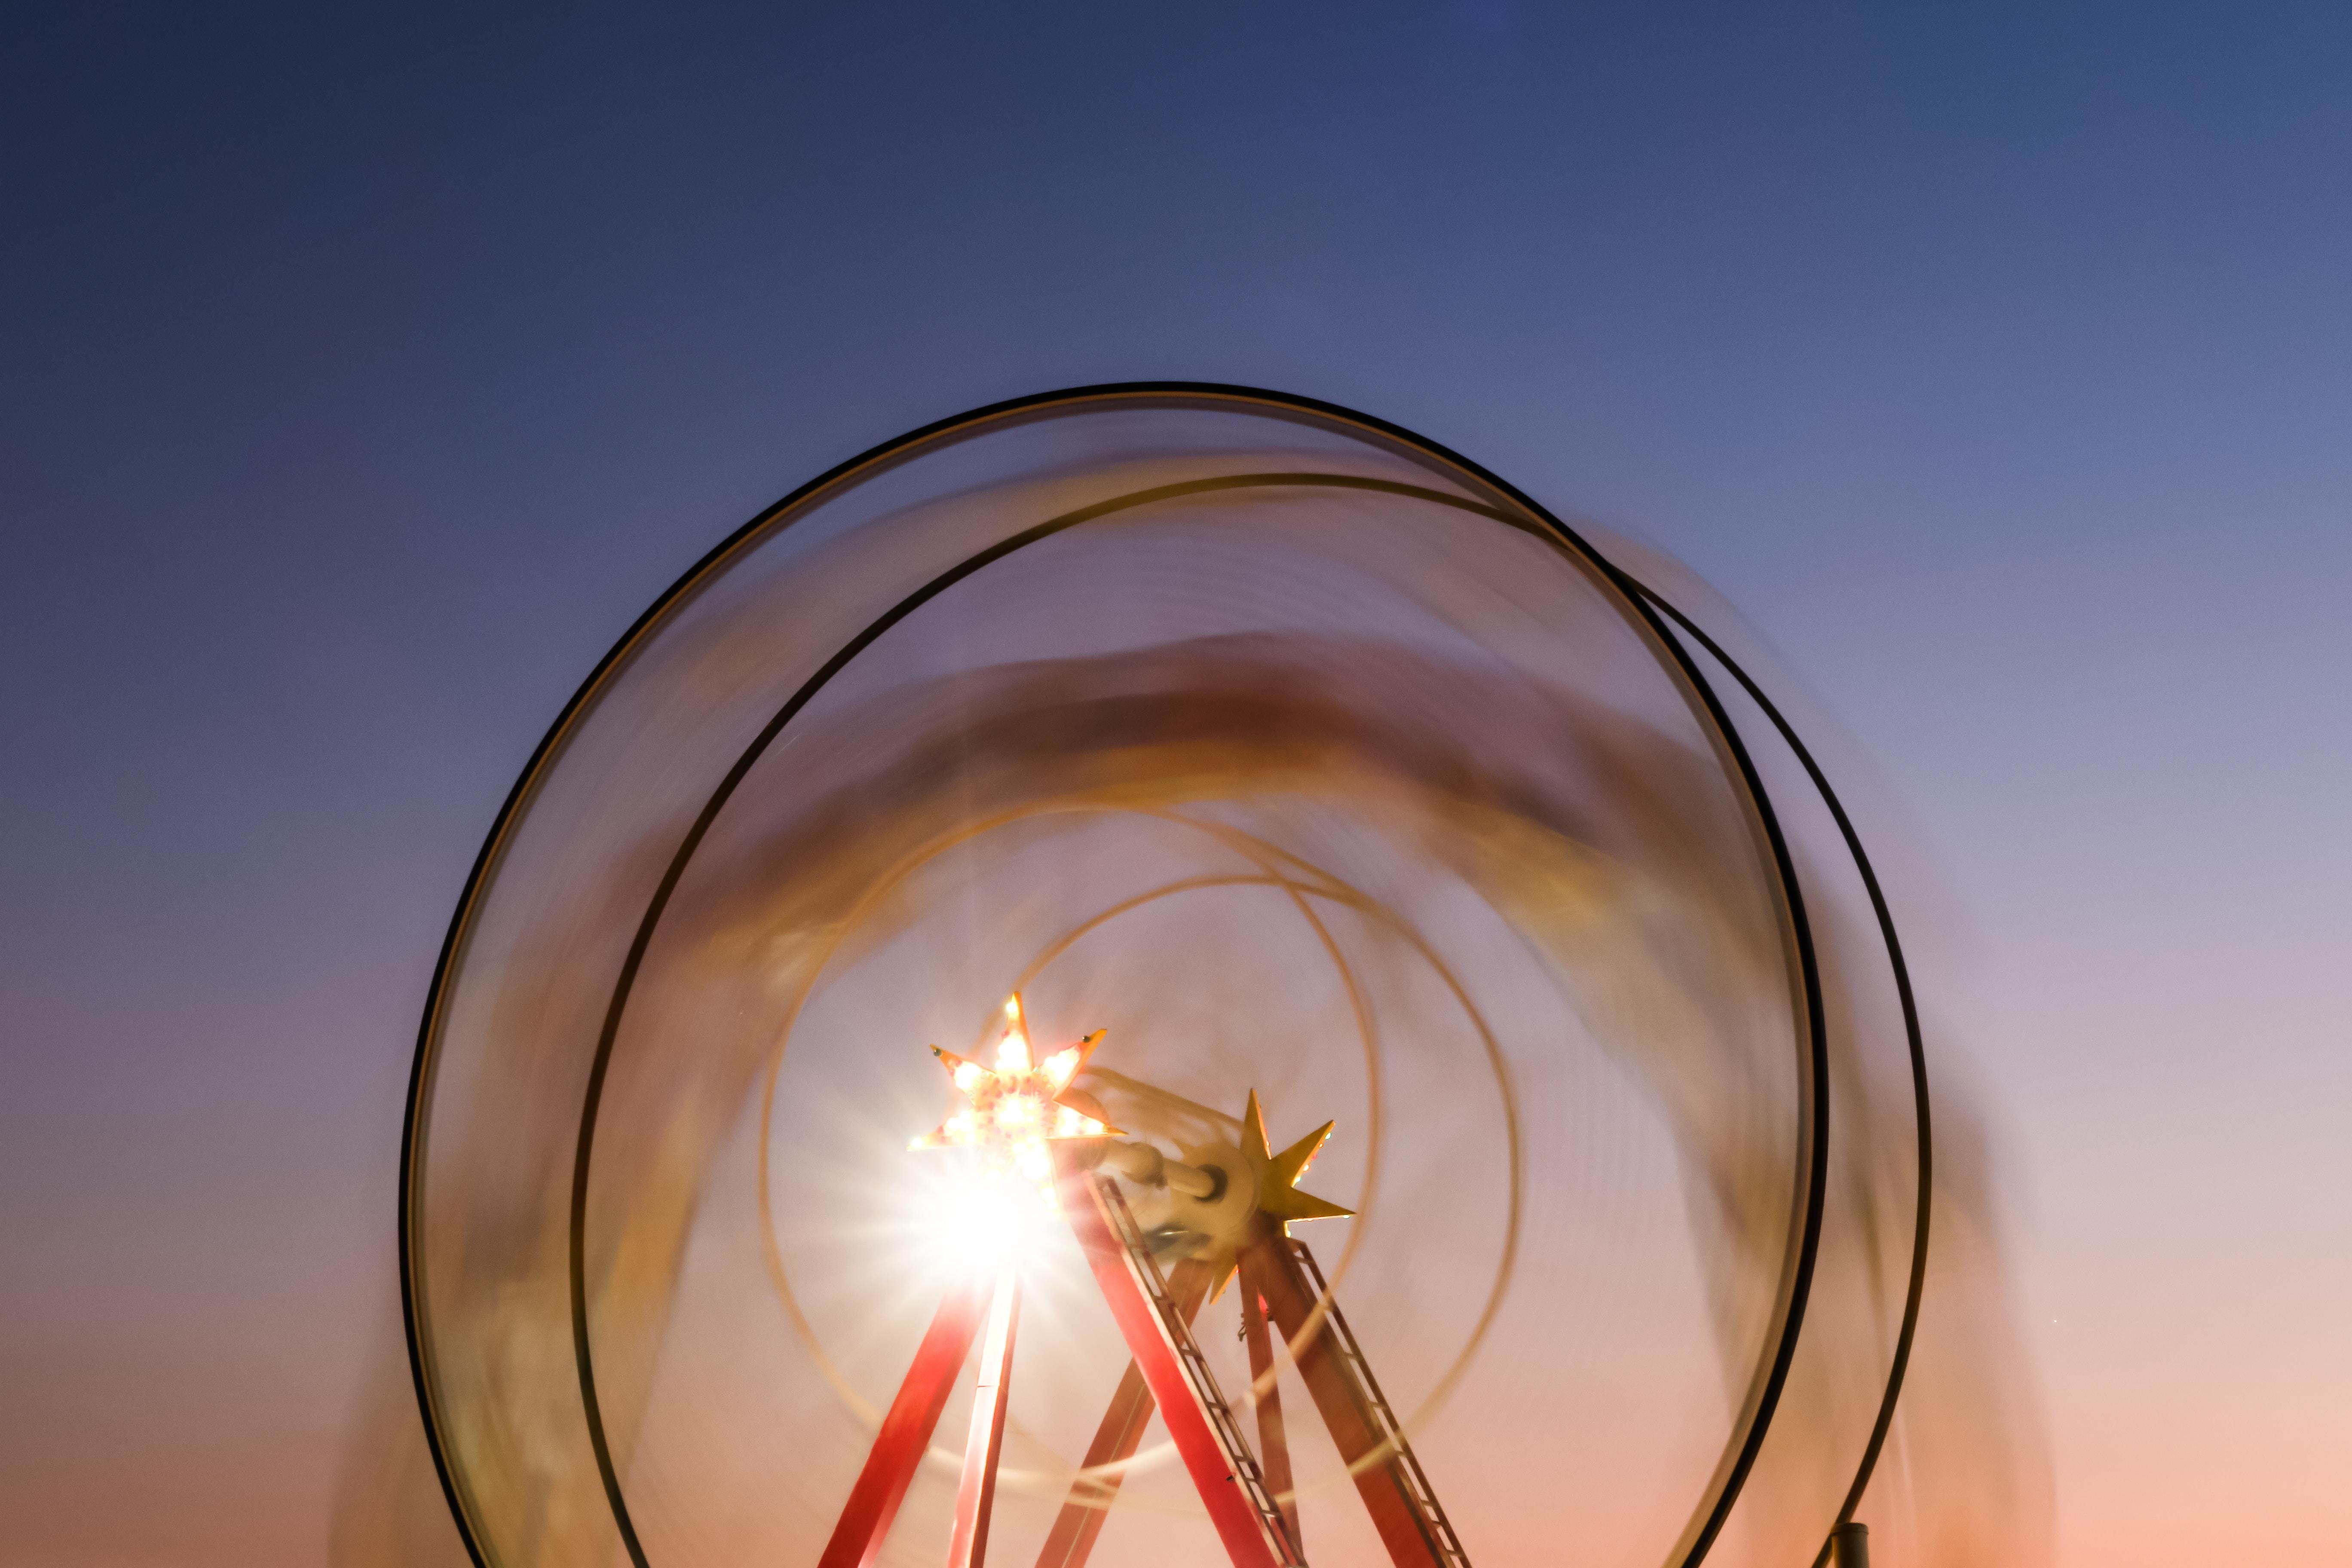 A ferris wheel in Greece's third-largest city, Patras